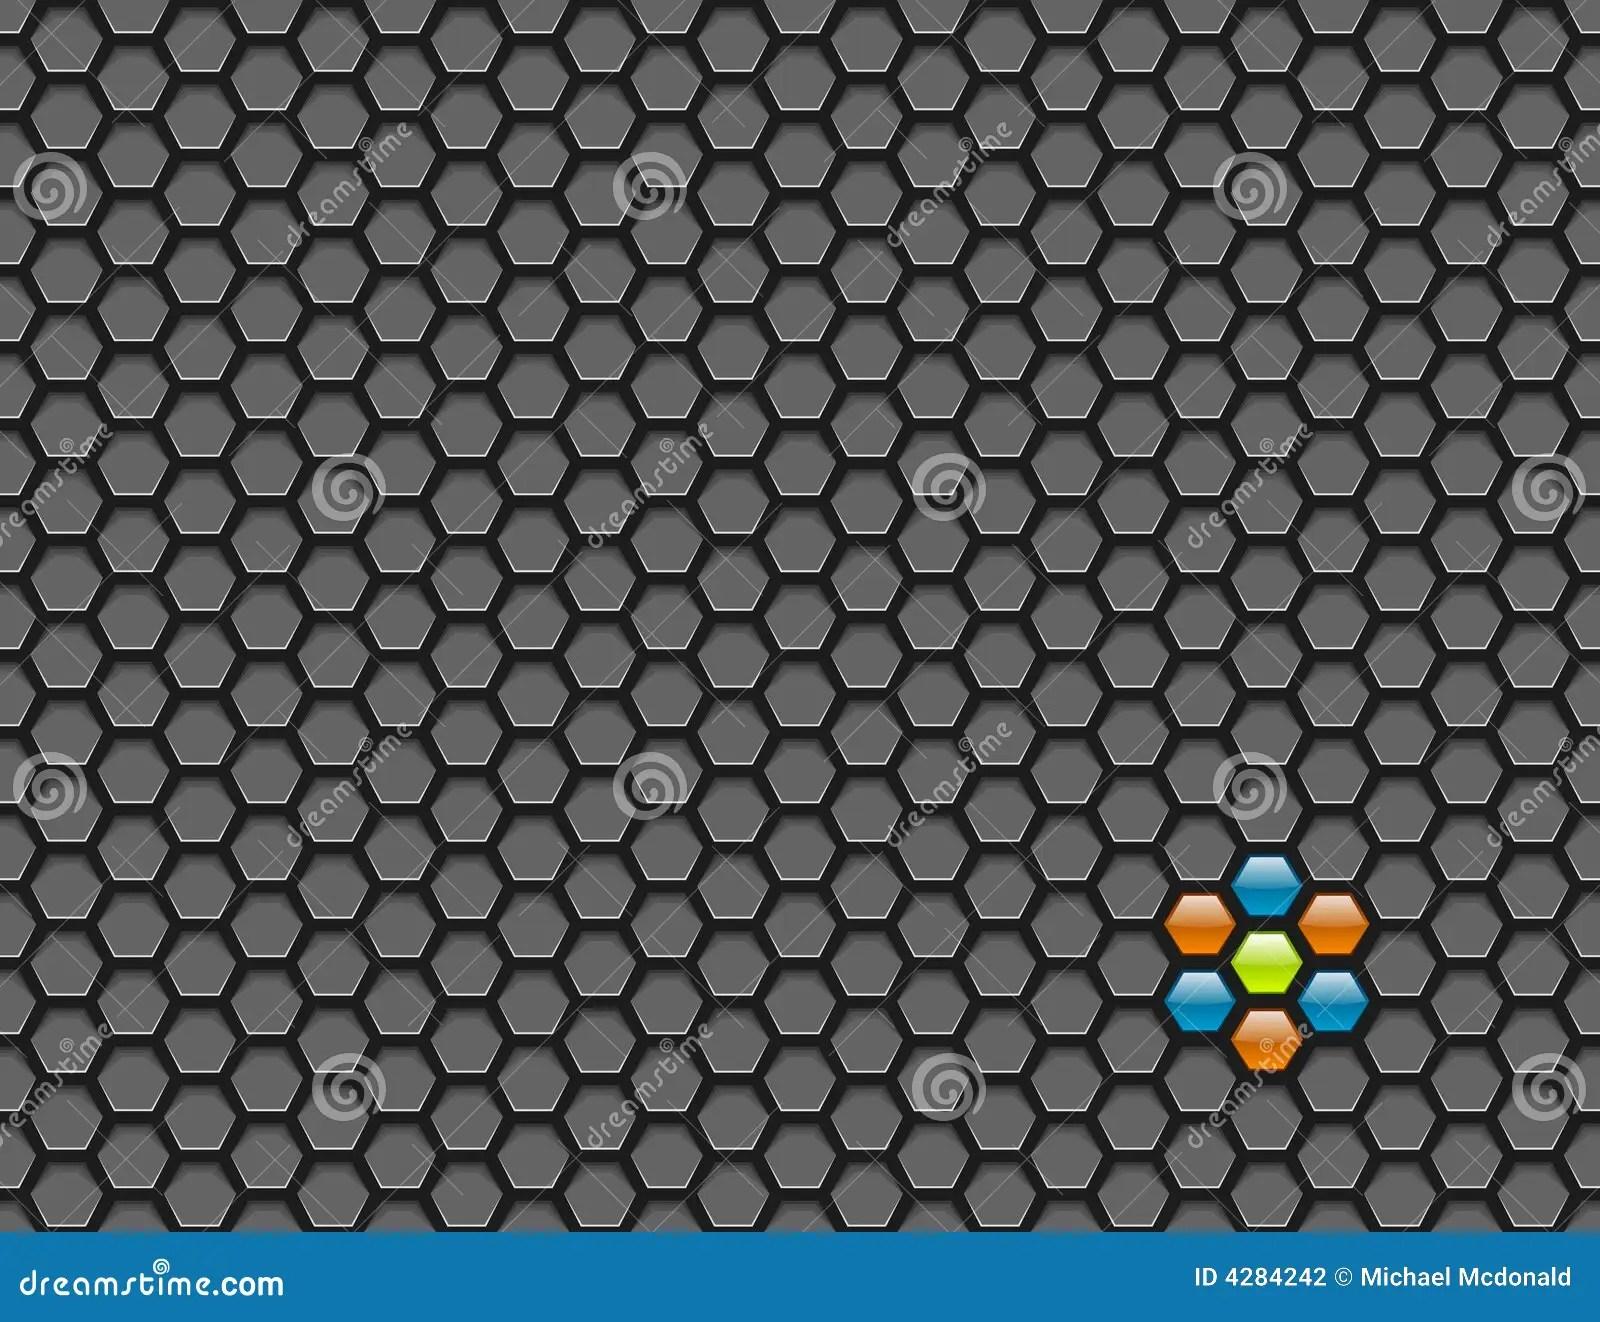 Hexagon Mesh Background Stock Photography  Image 4284242